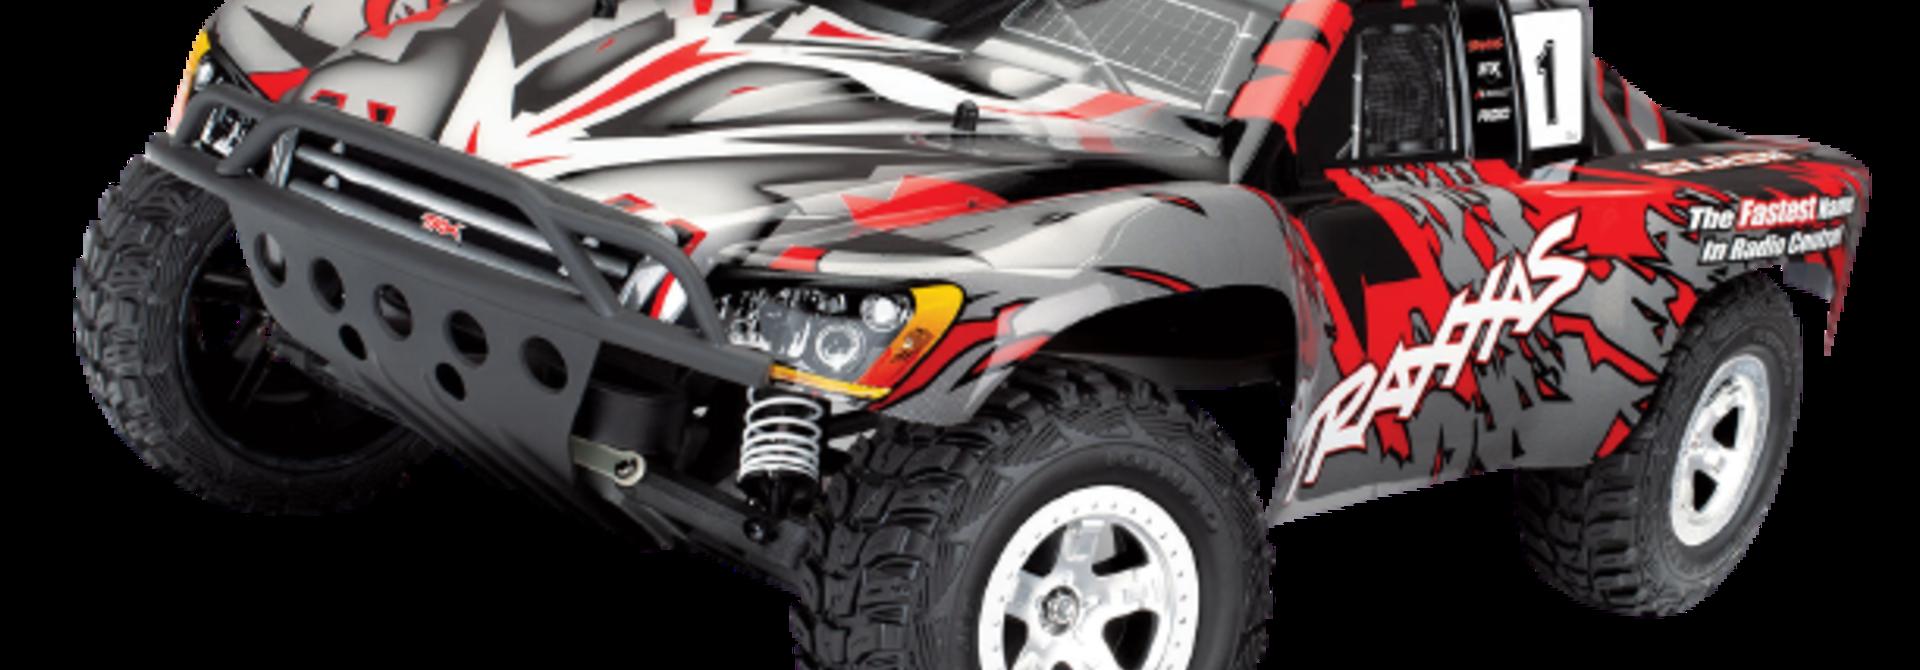 Traxxas Slash 2WD XL-5 TQ (no battery/charger), Red, TRX58024-R